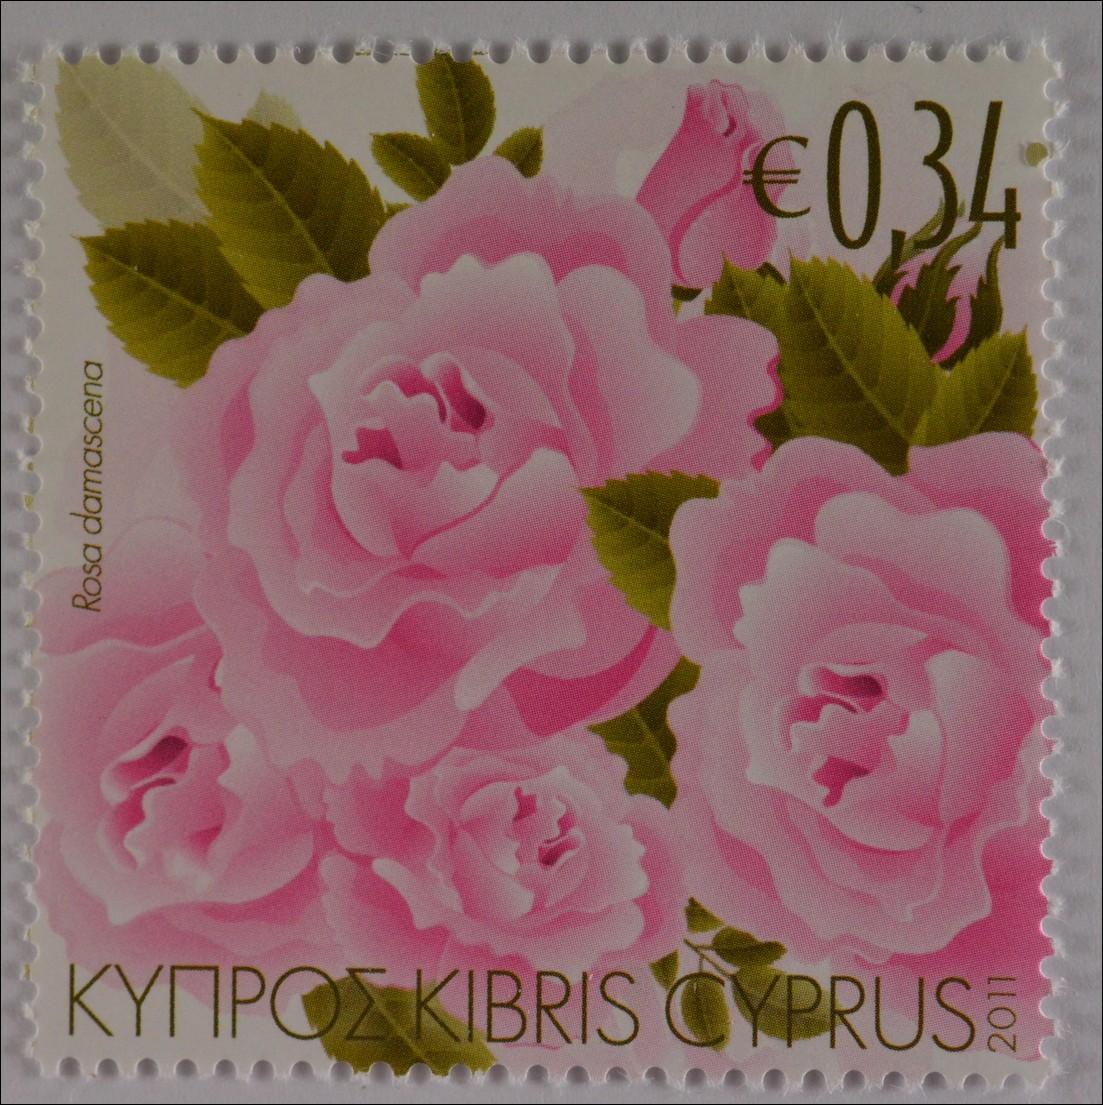 cyprus greek cyprus 2011 mi no 1204 scented plants cyprus rose ebay. Black Bedroom Furniture Sets. Home Design Ideas